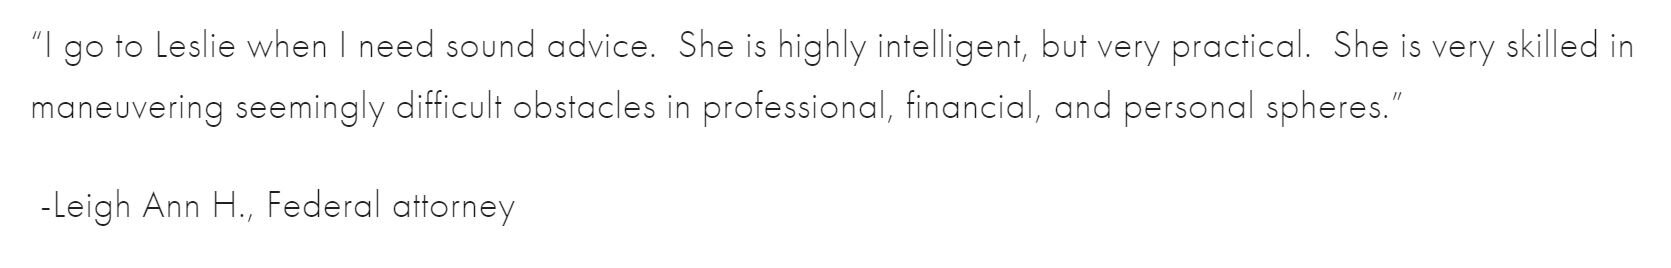 Leigh Ann CEO attorney CFO, small business owner.JPG